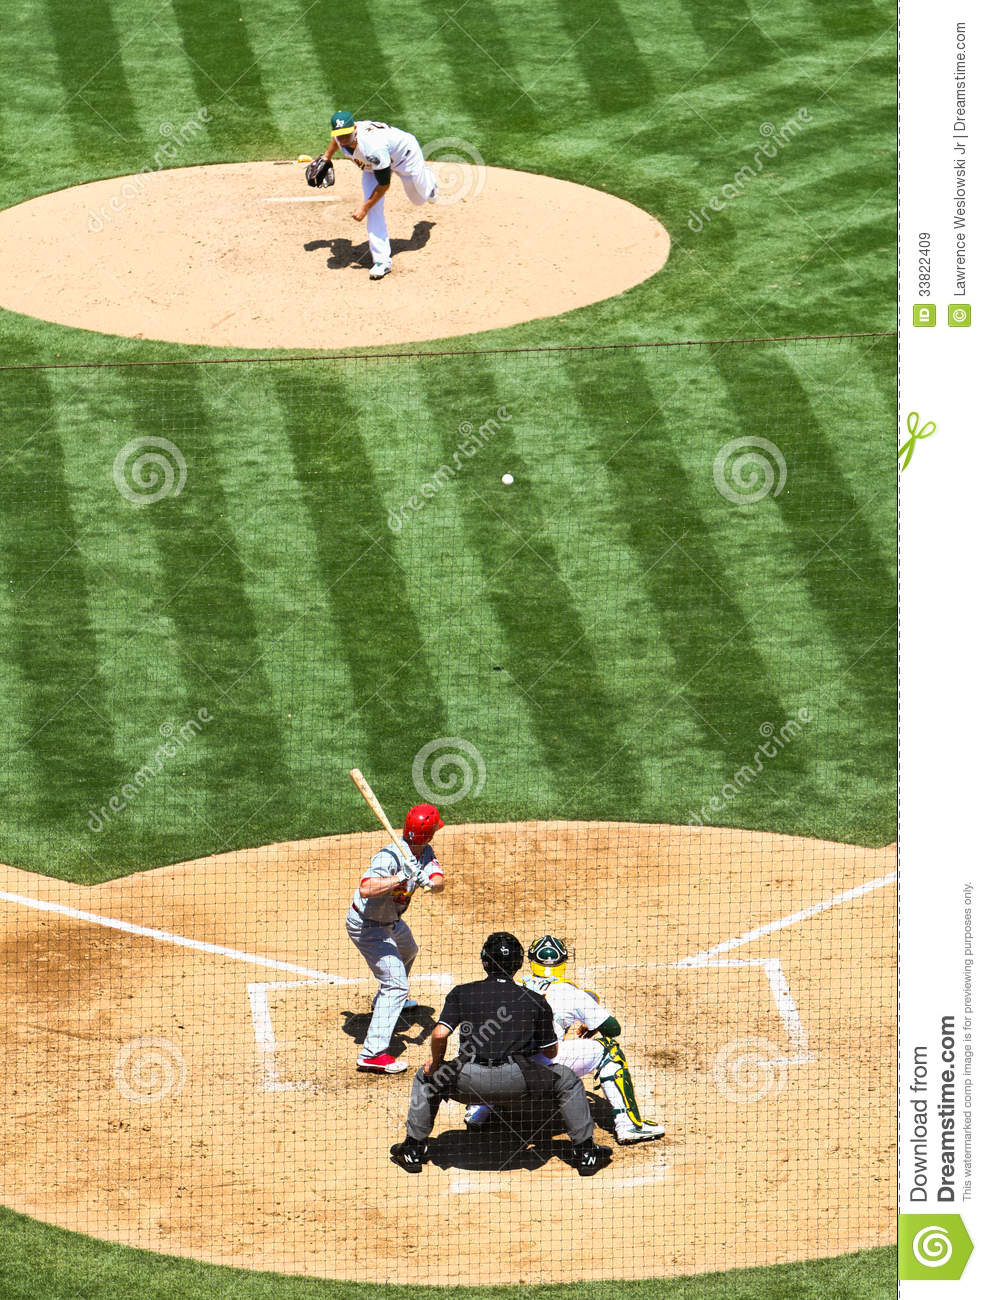 Major League Baseball Pitcher Vs Batter Editorial Stock Image.